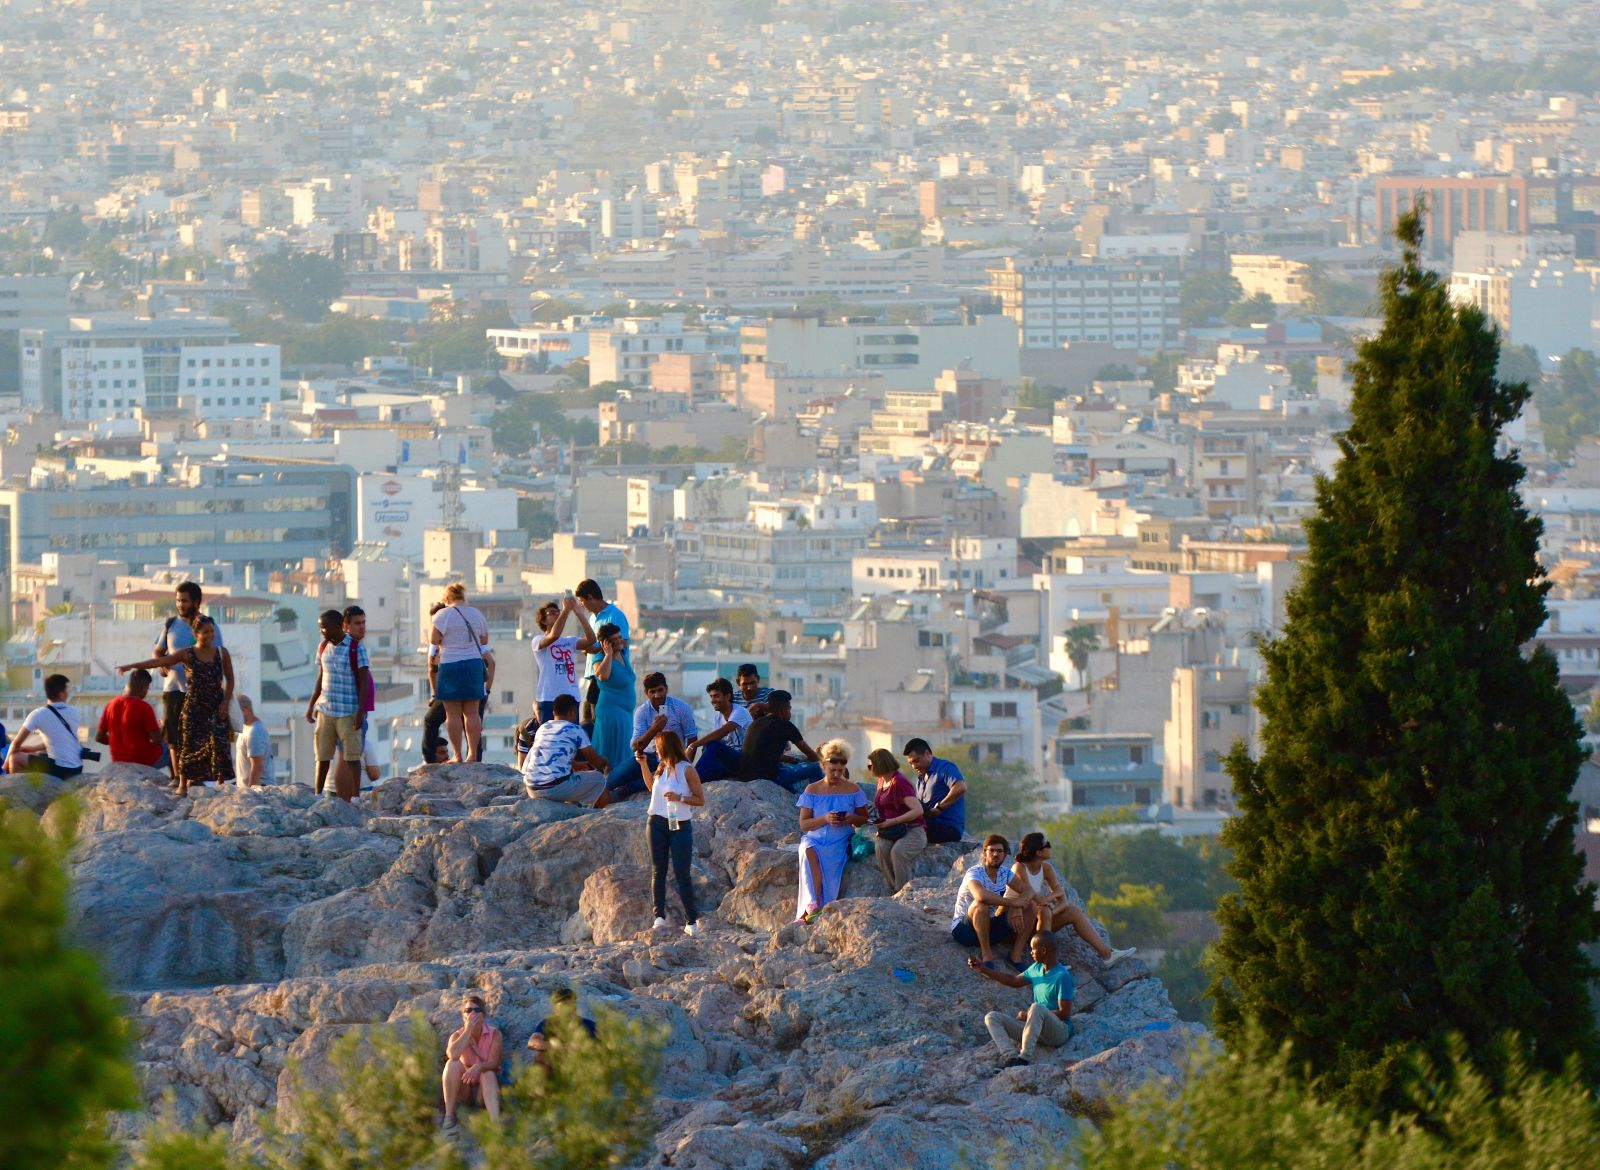 athens-rock-acropolis